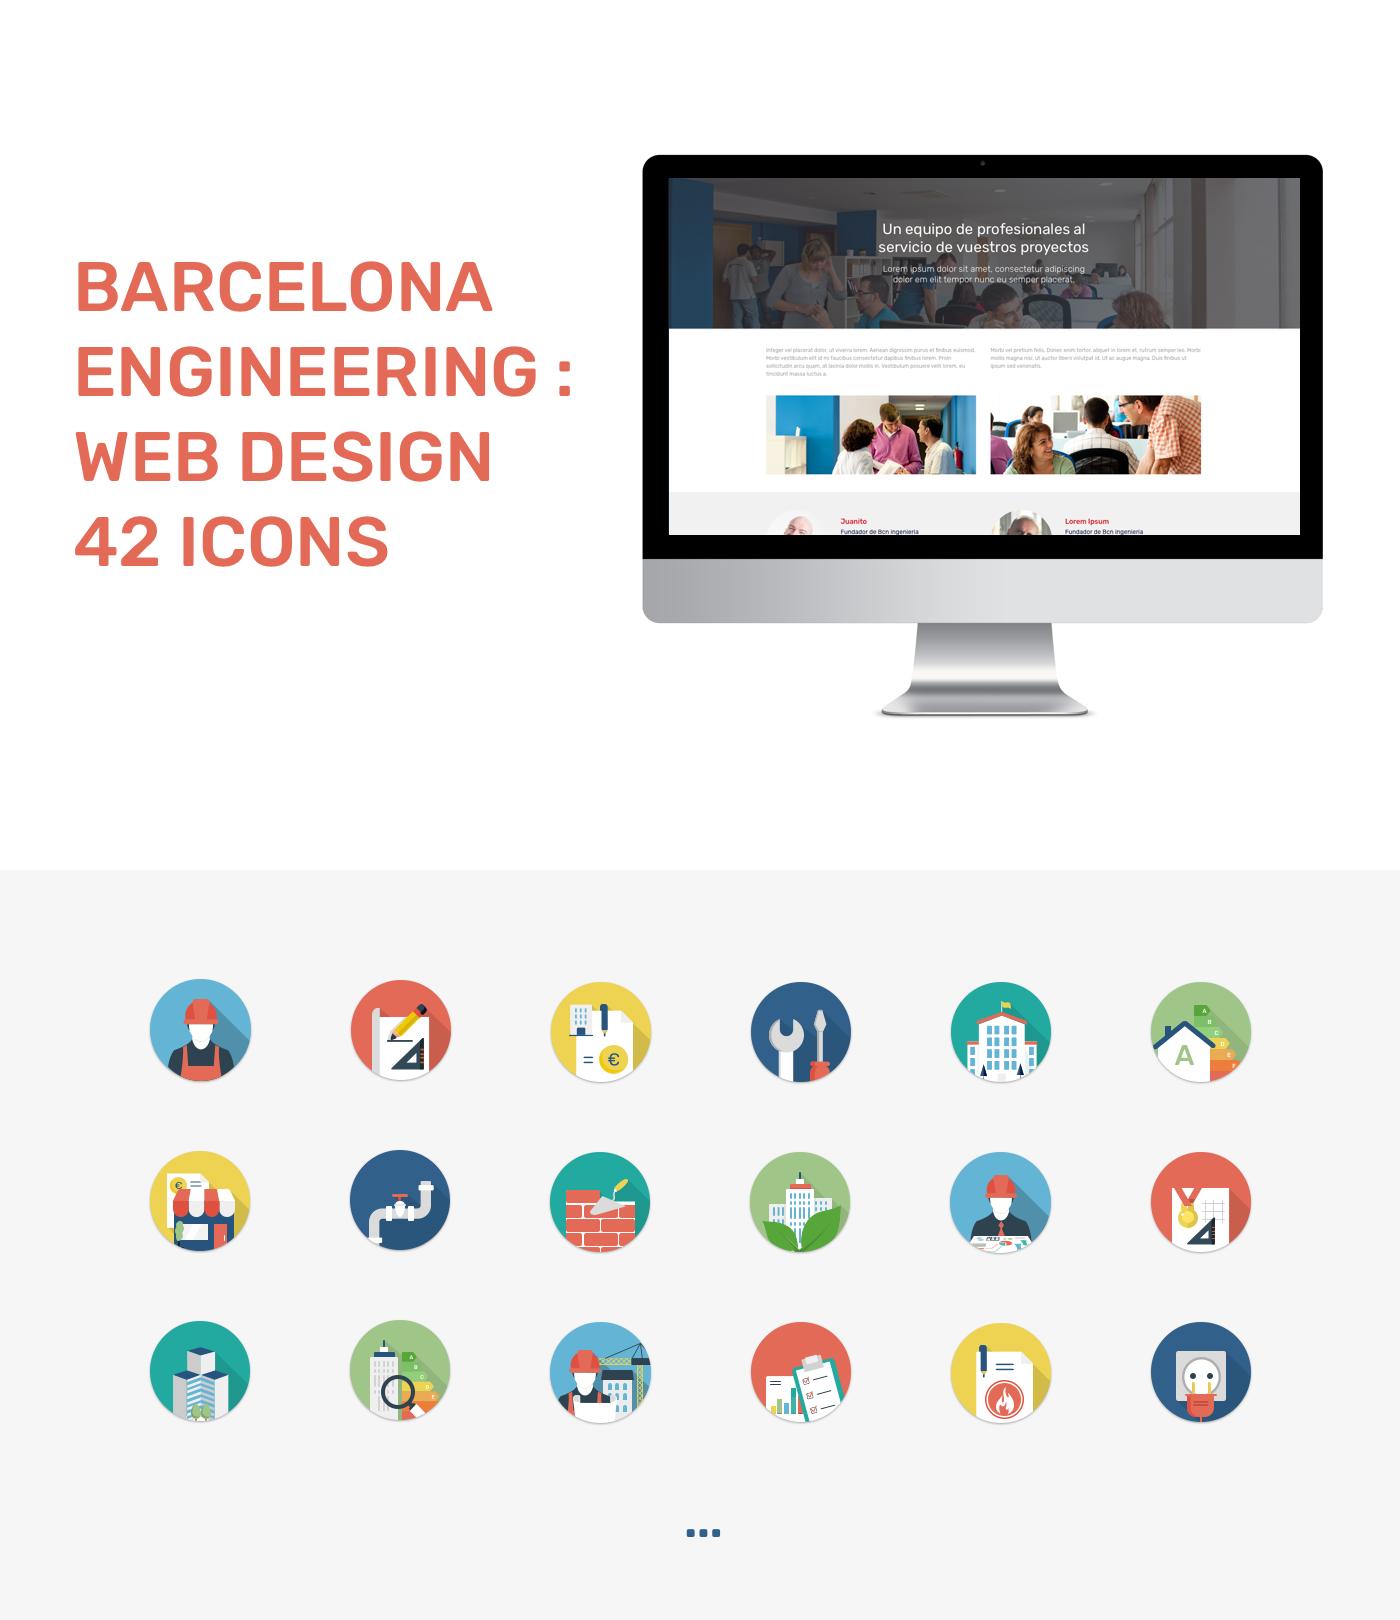 barcelona ingenieria project